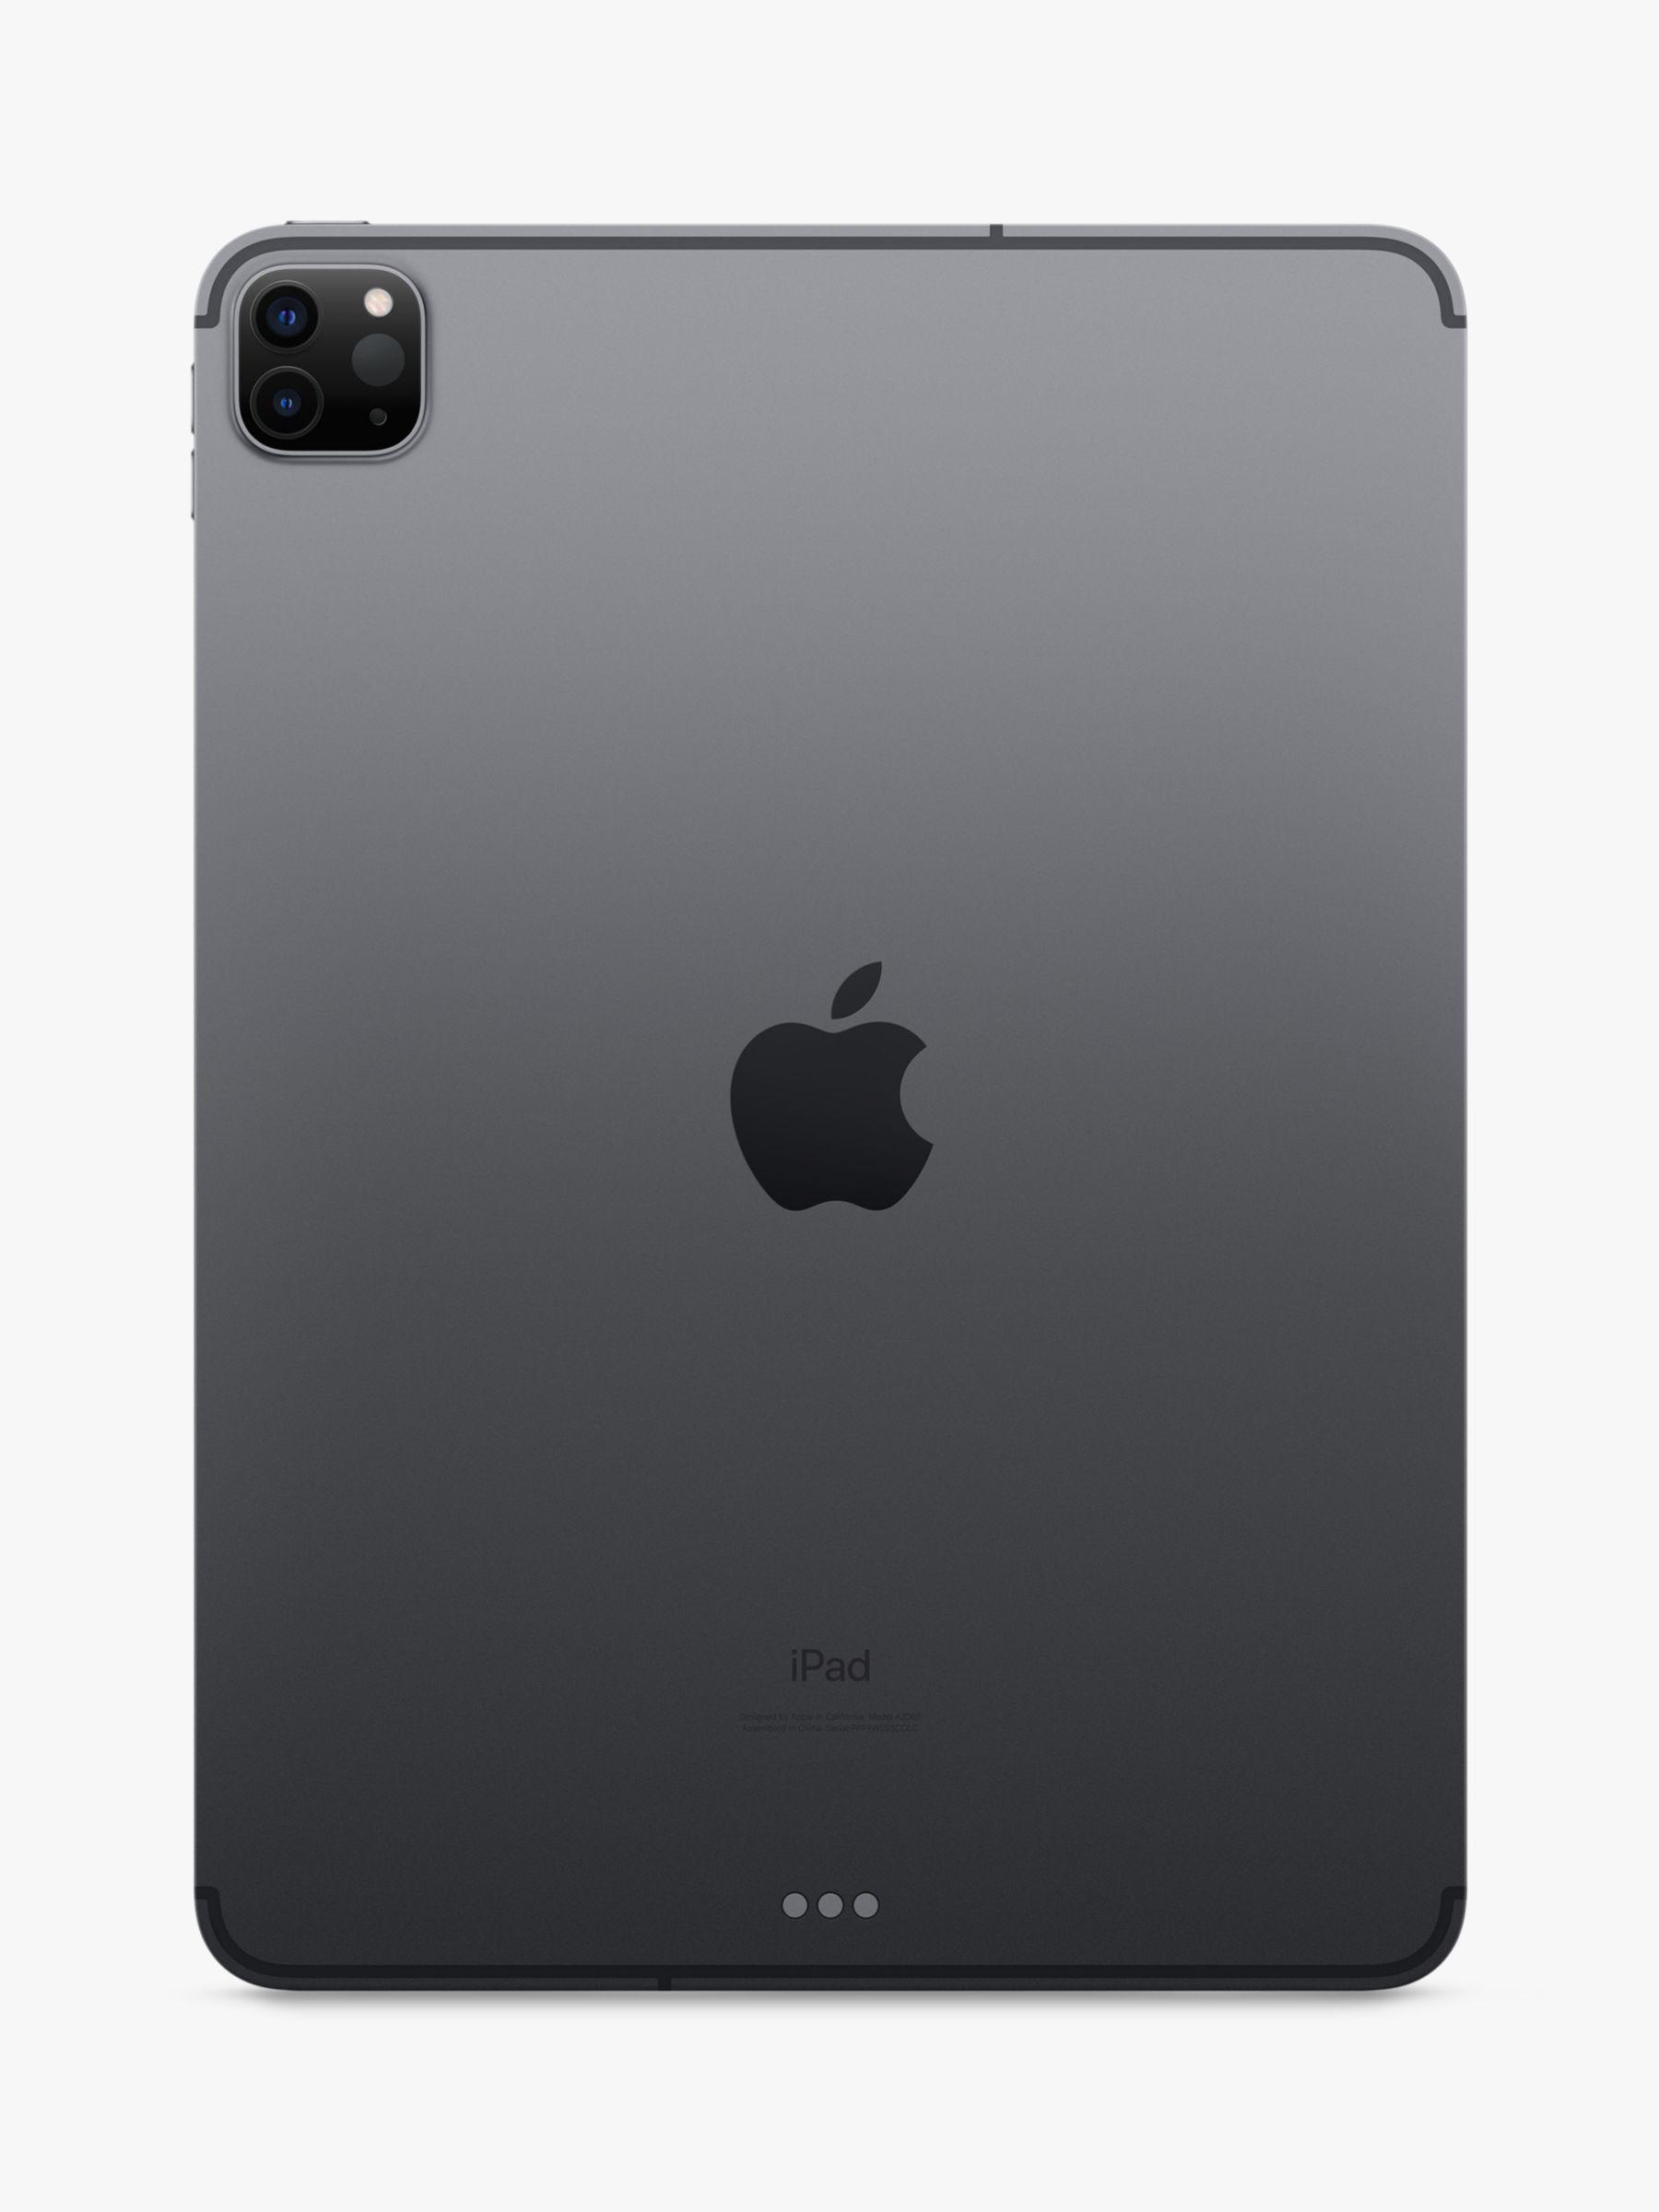 2020 Apple Ipad Pro 11 A12z Bionic Ios Wi Fi Cellular 512gb At John Lewis Partners